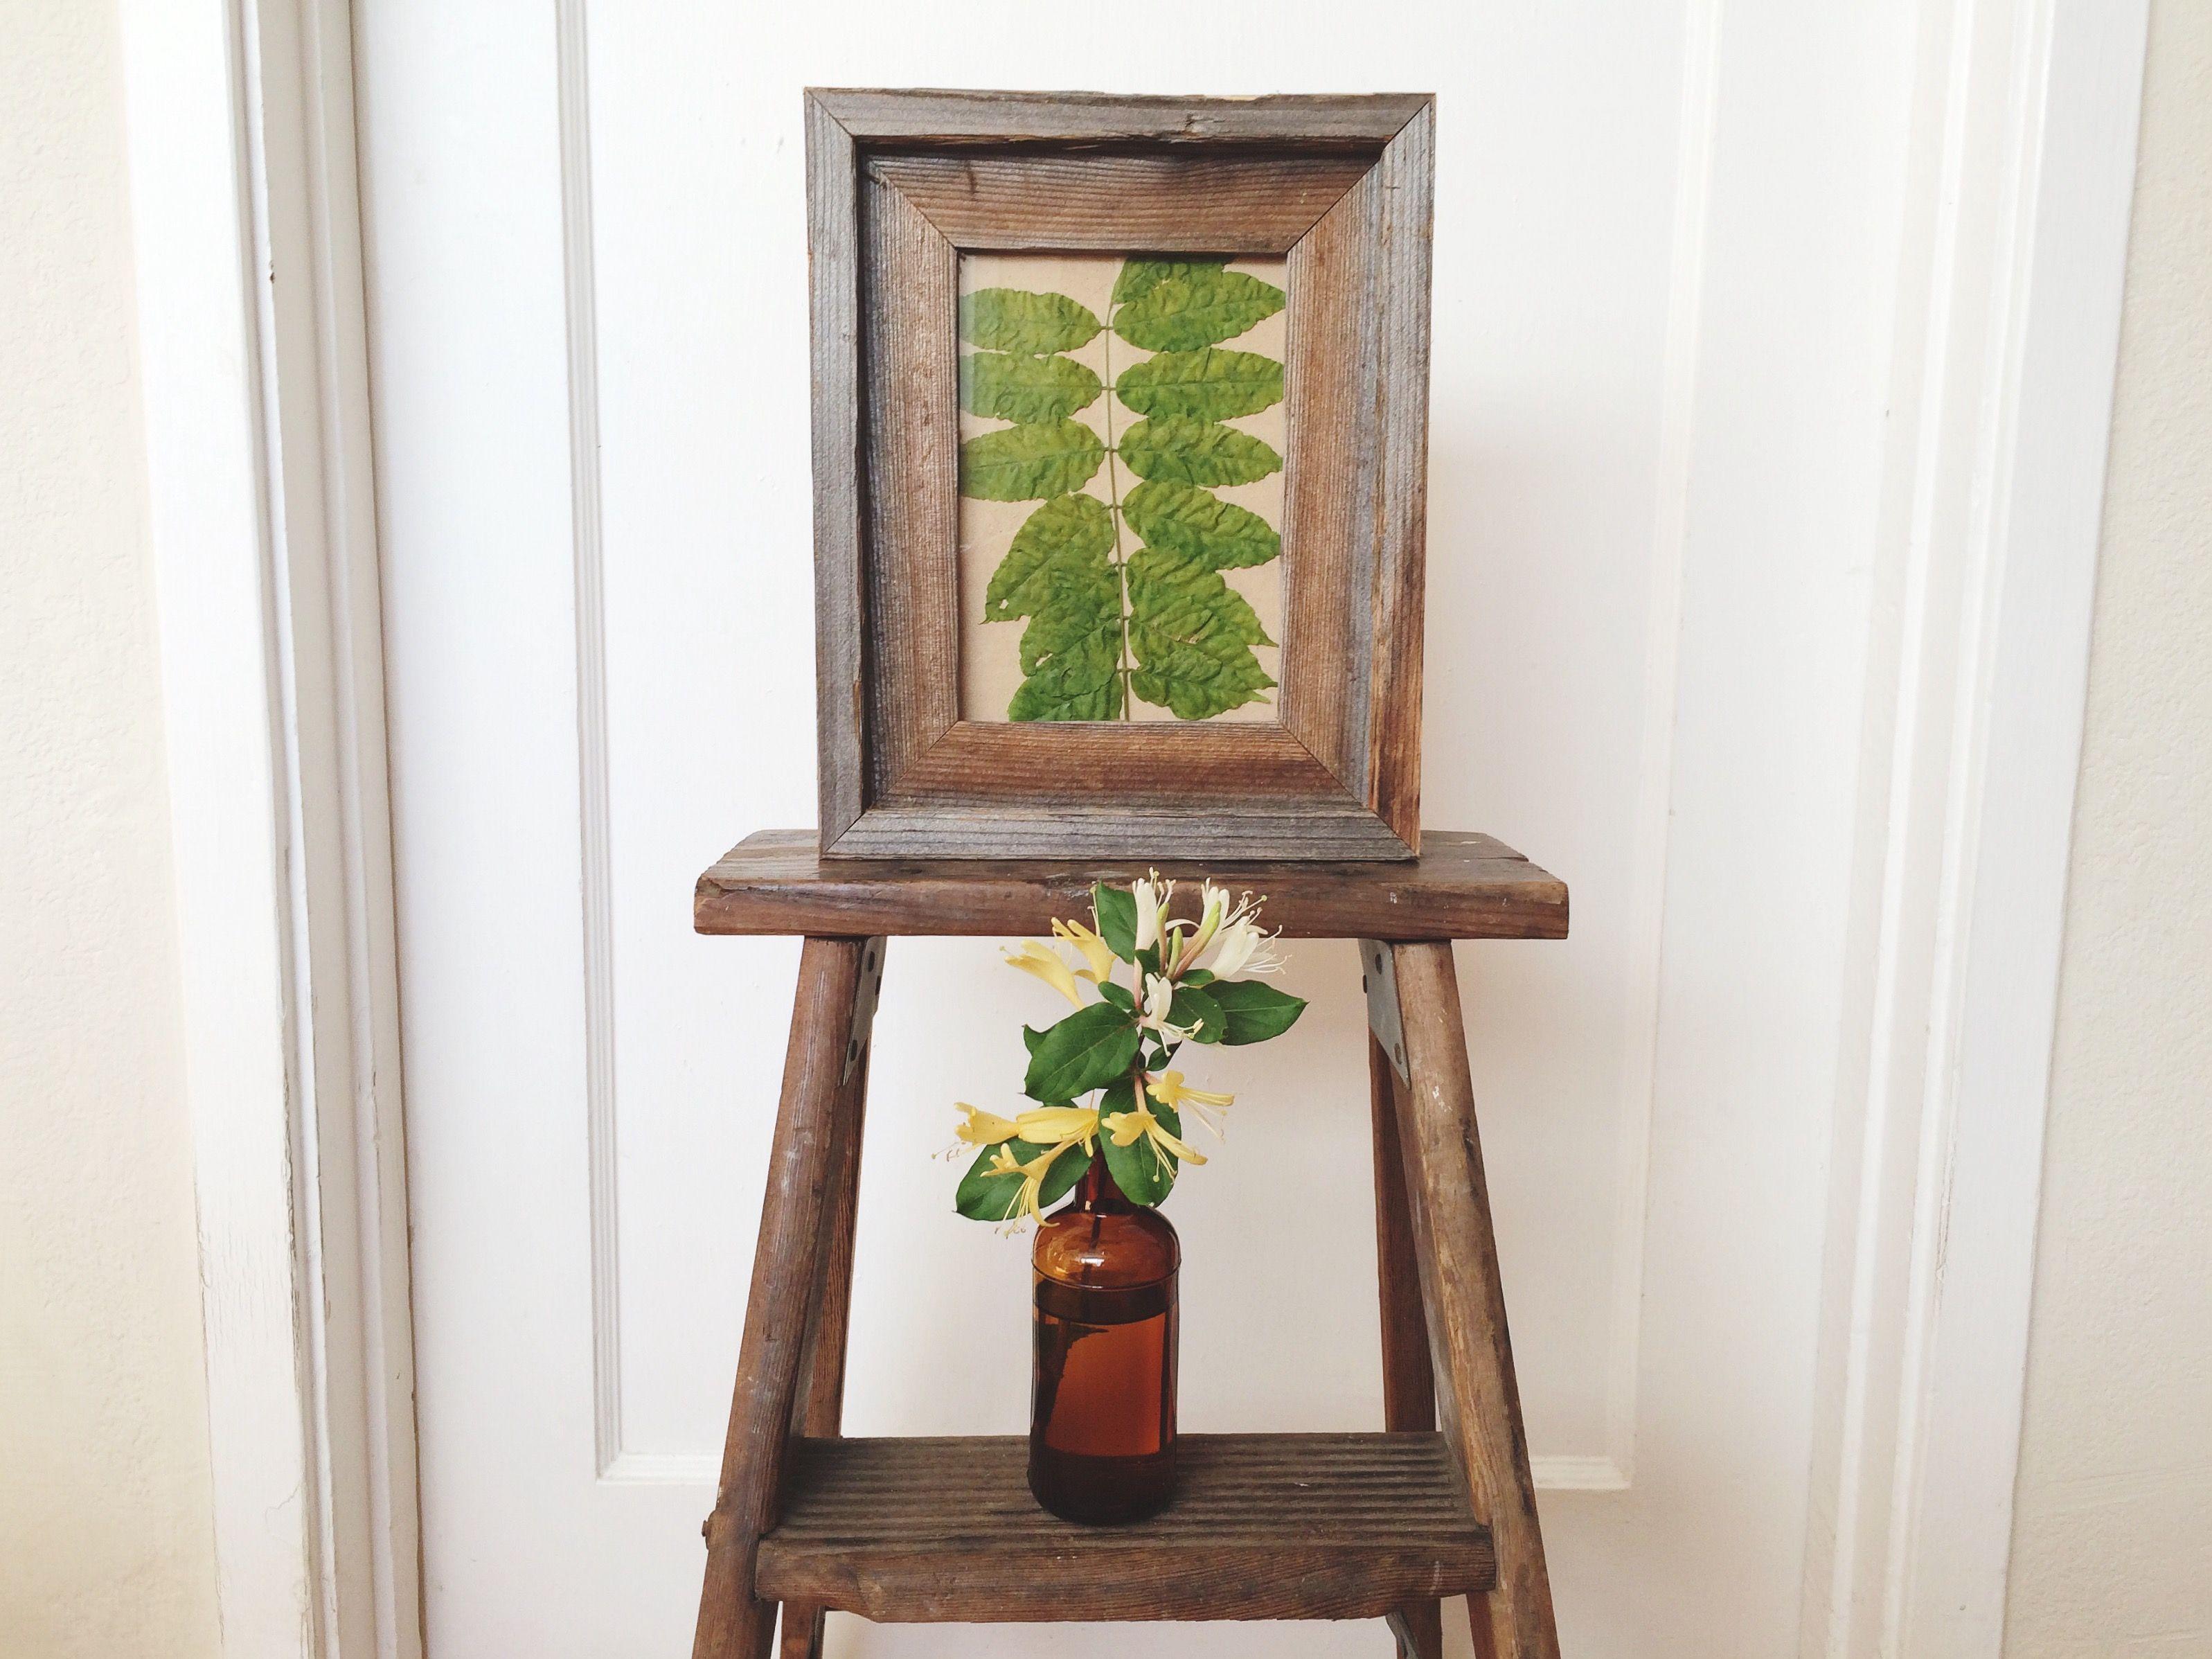 Flora Fauna Study Reclaimed Wood 5x7 Frame By Alibi Interiors